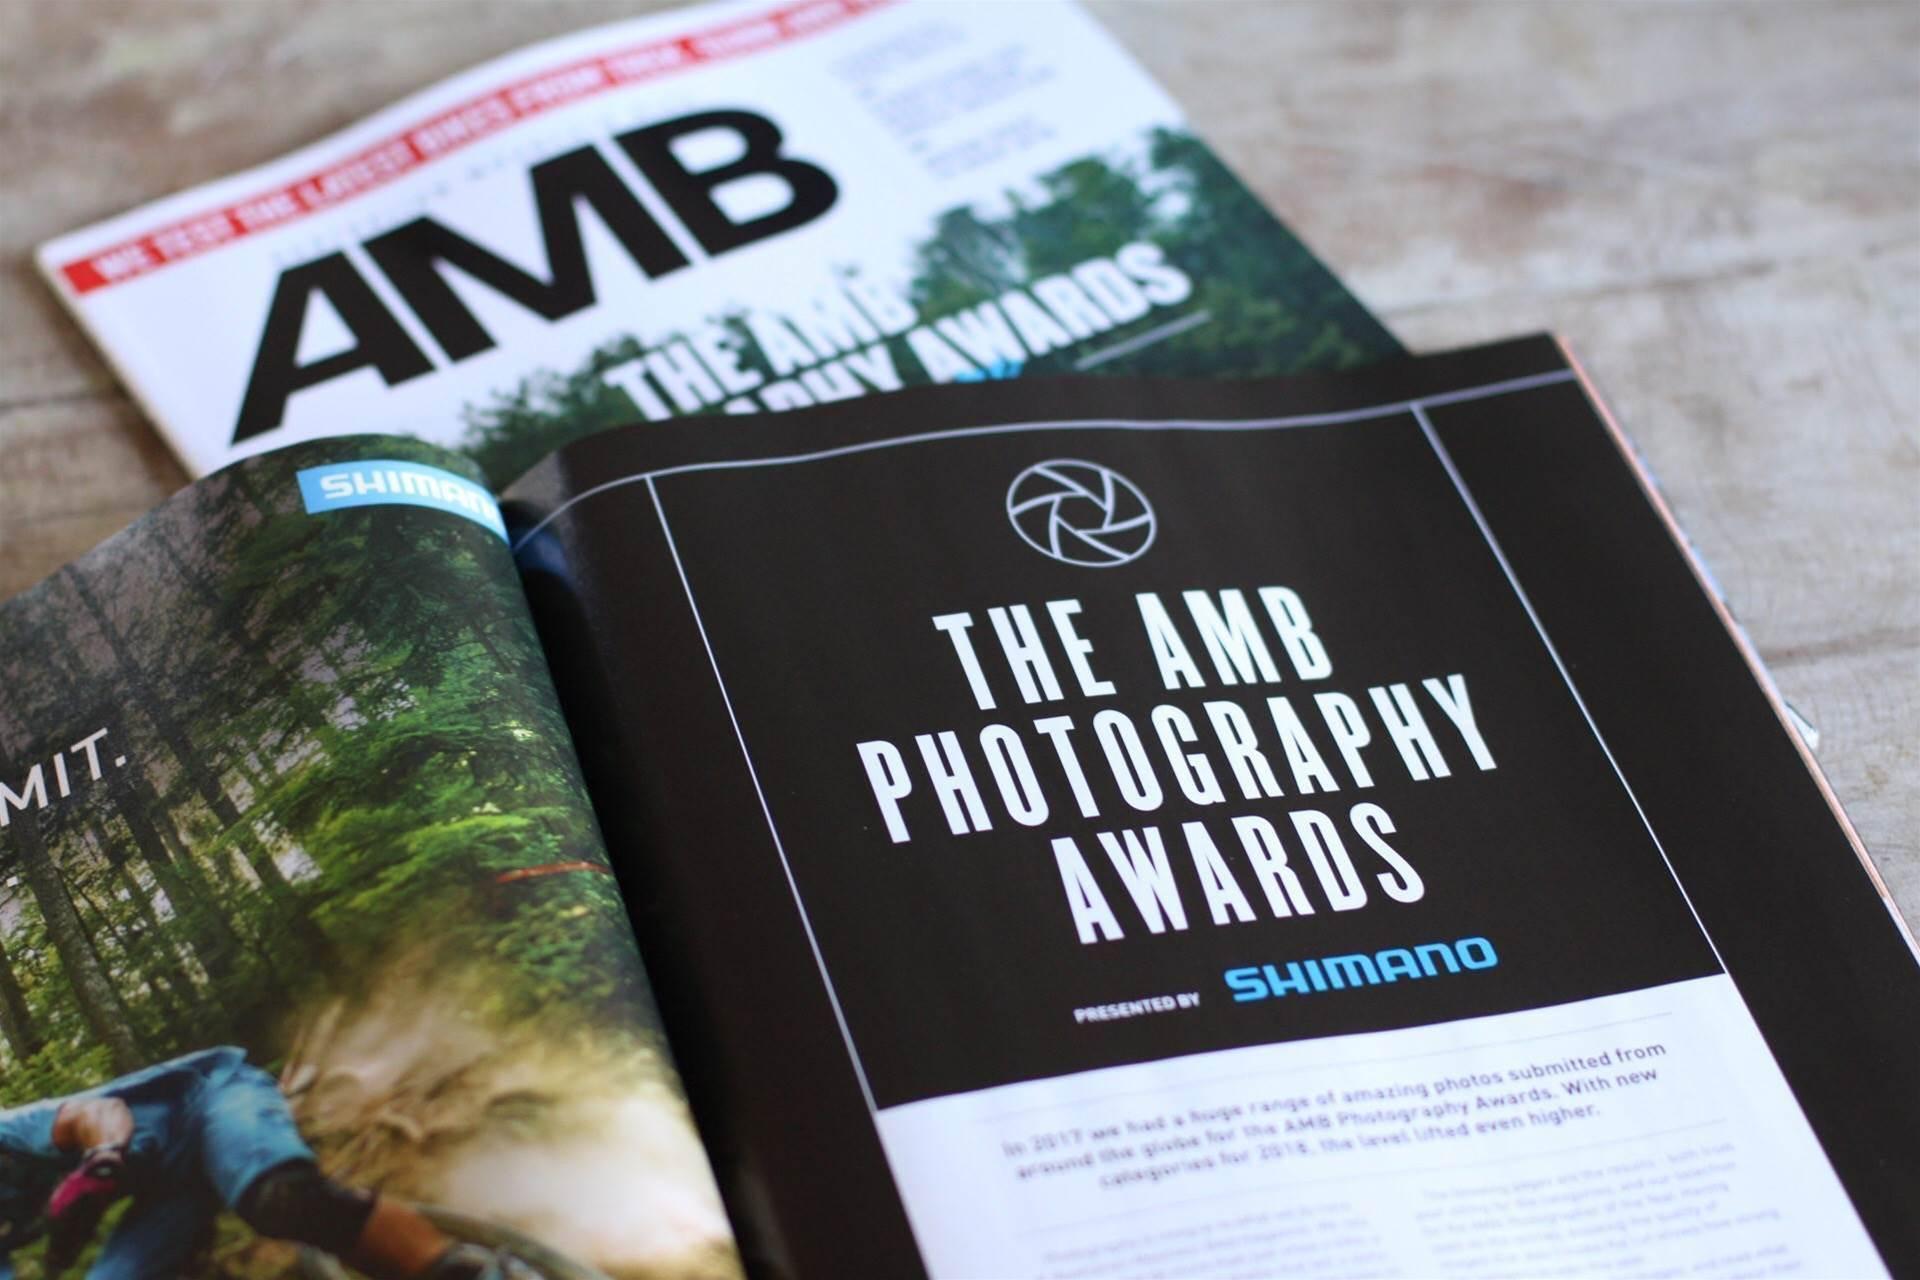 AMB Photography Awards presented by Shimano